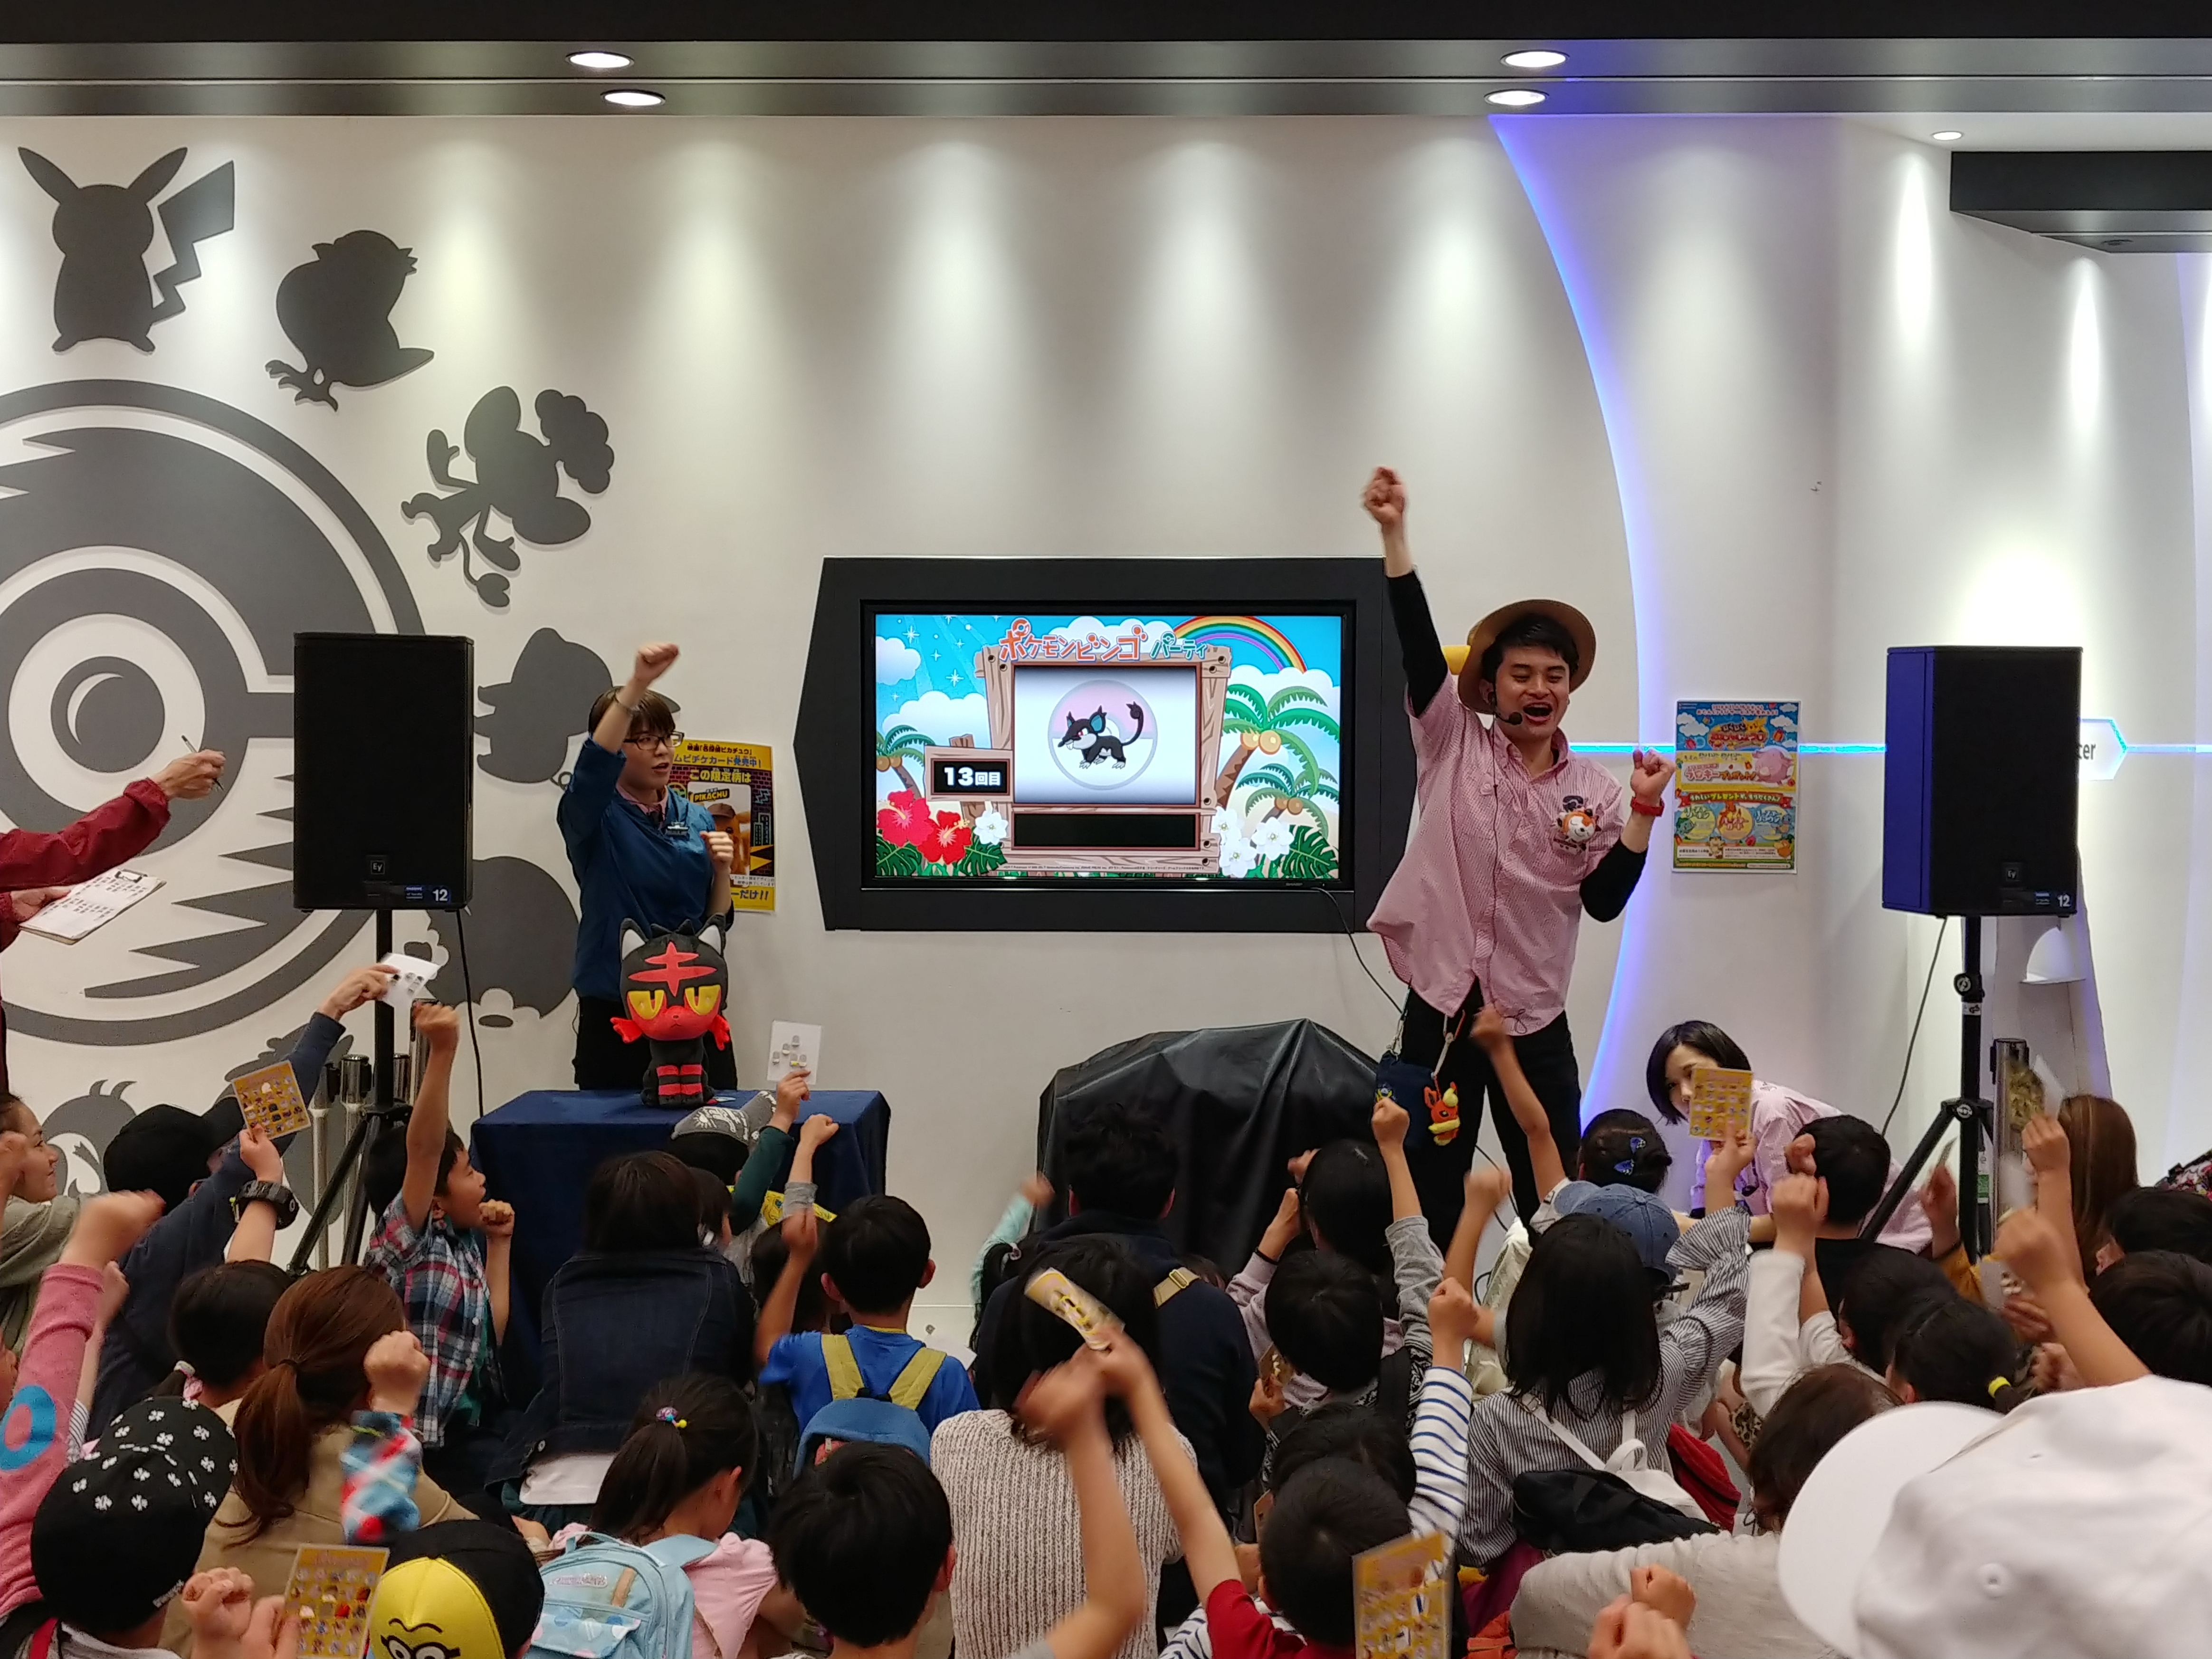 https://voice.pokemon.co.jp/stv/fukuoka/%E3%83%93%E3%83%B3%E3%82%B4%E3%83%91%E3%83%BC%E3%83%86%E3%82%A3.jpg